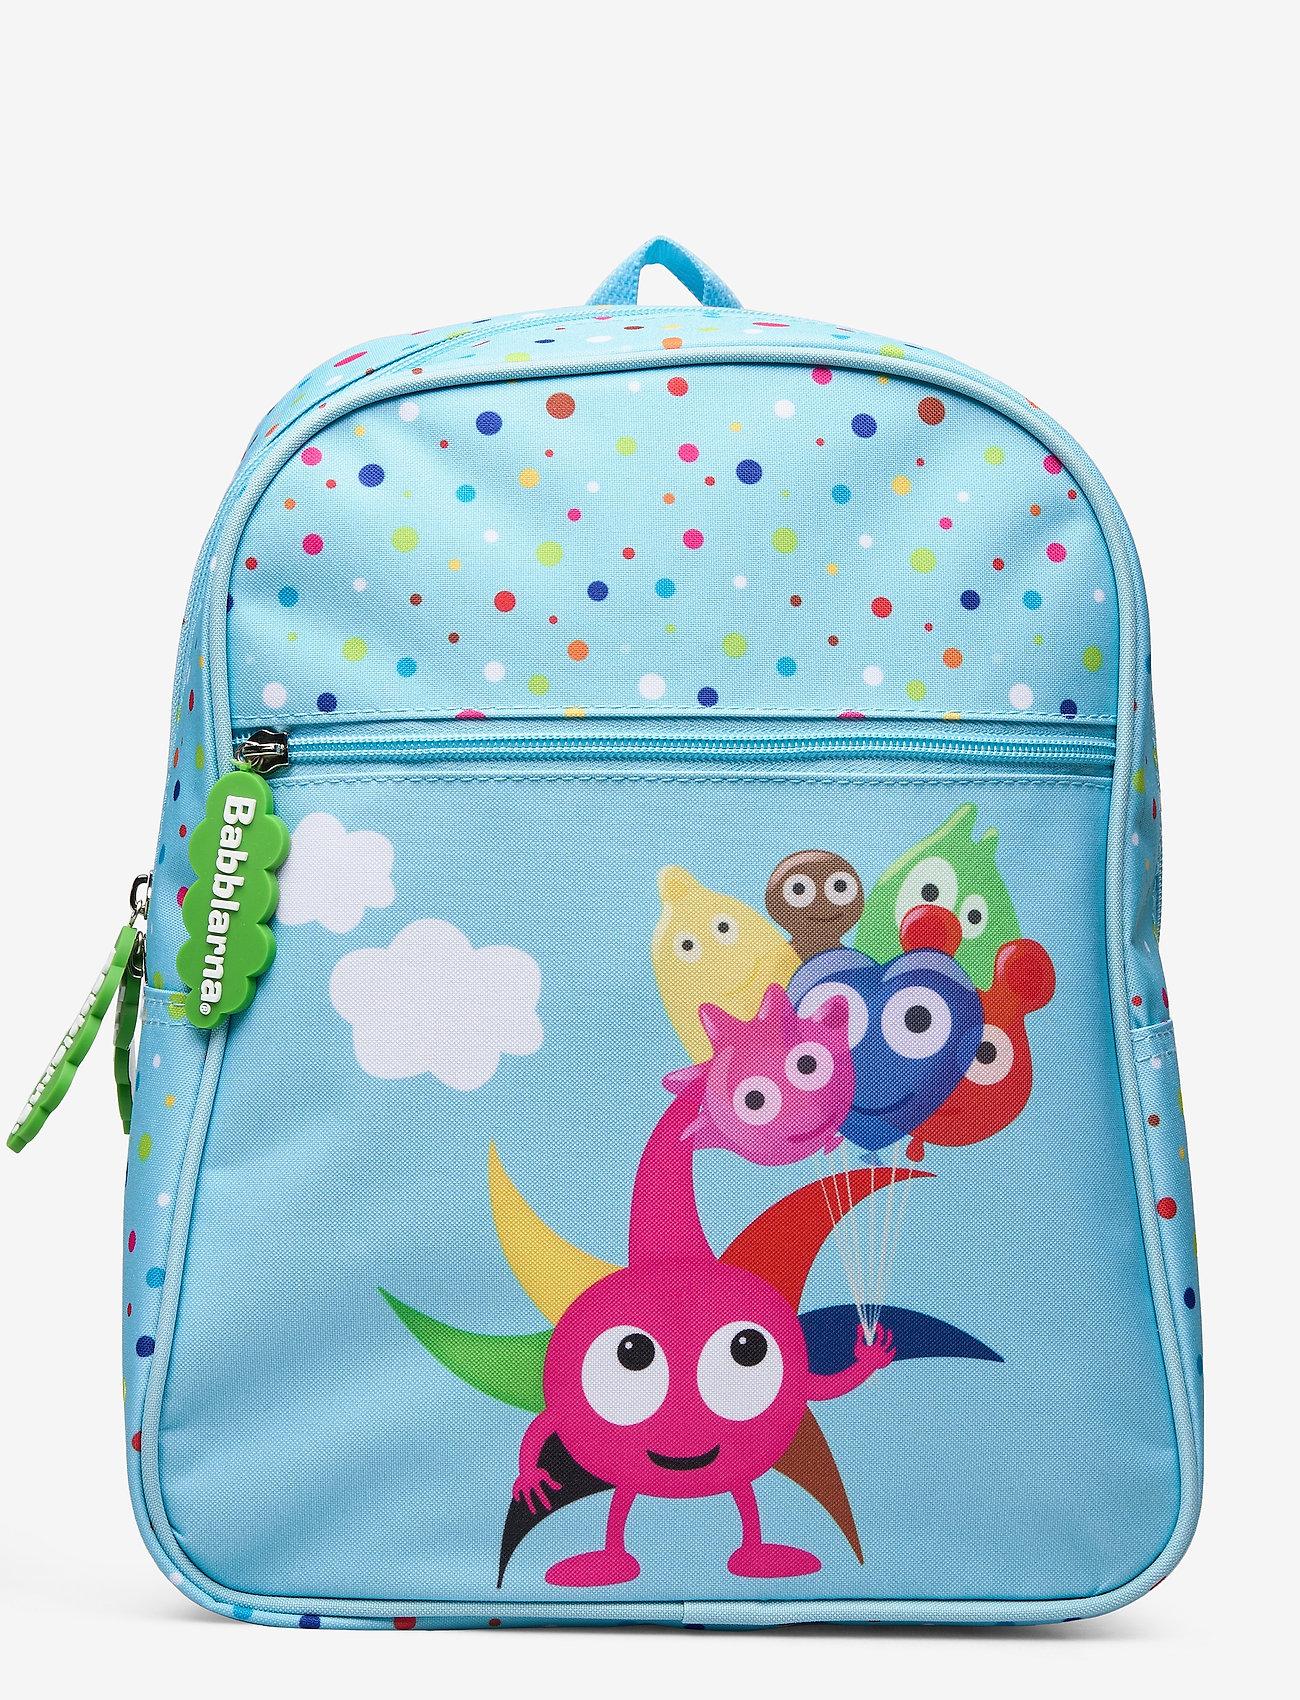 BABBLARNA small backpack